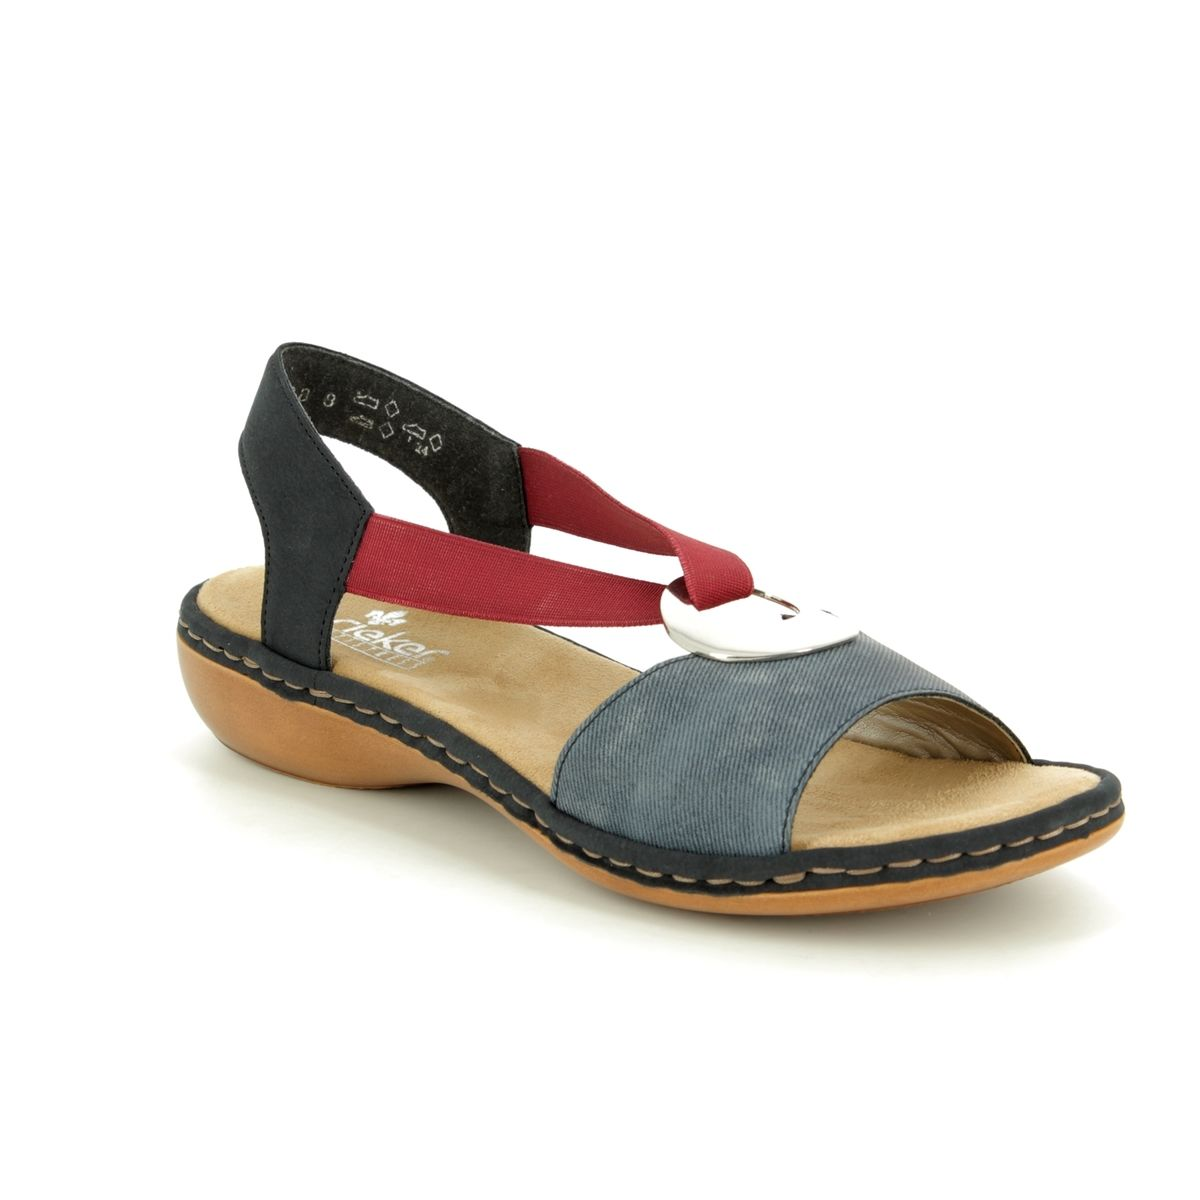 Rieker 659Q9-14 Navy multi sandals